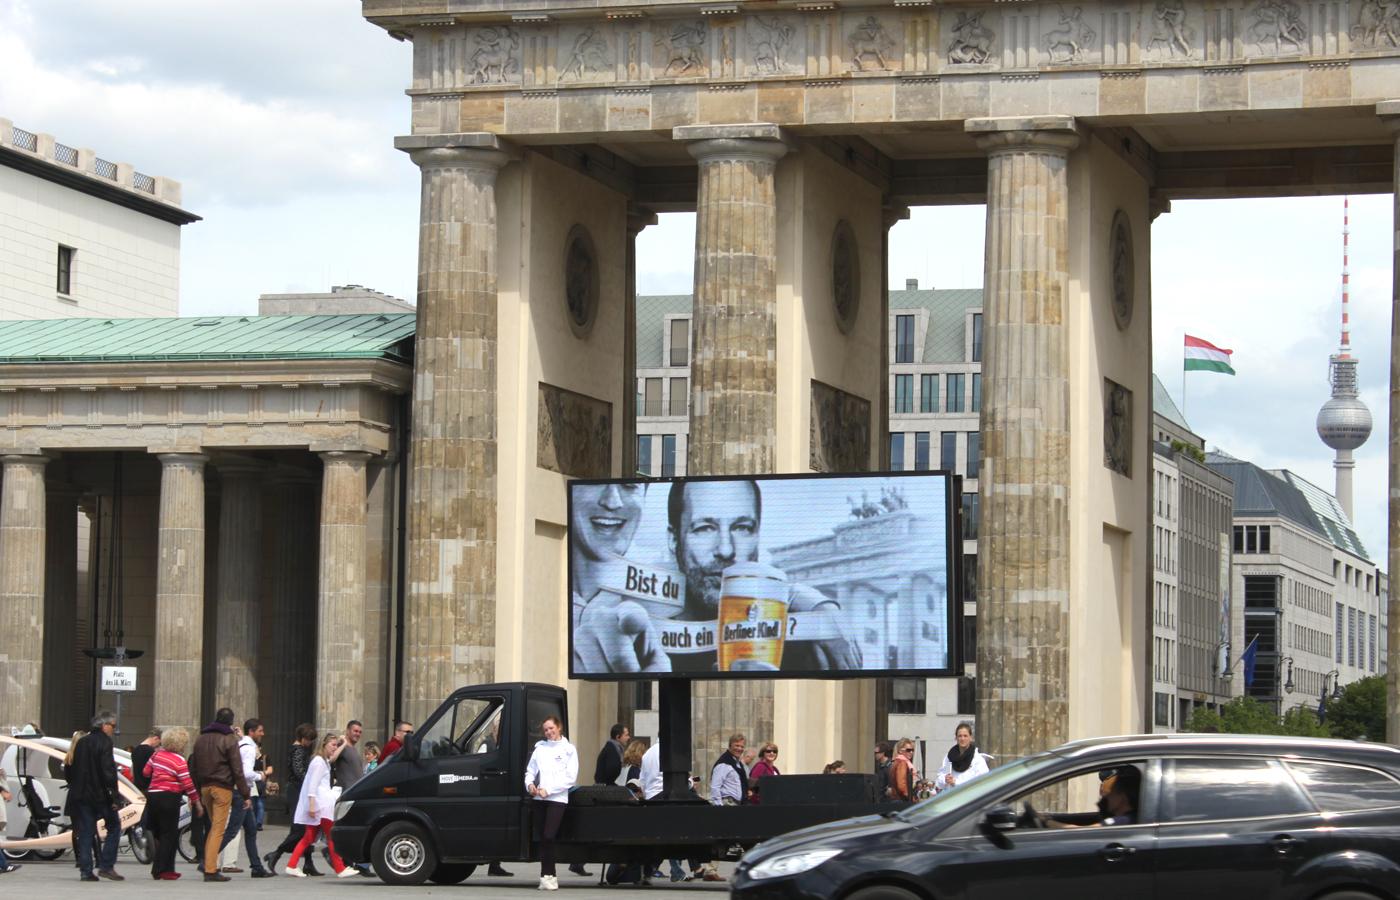 Berliner Kindl – Ich bin ein Berliner Kindl Promotion